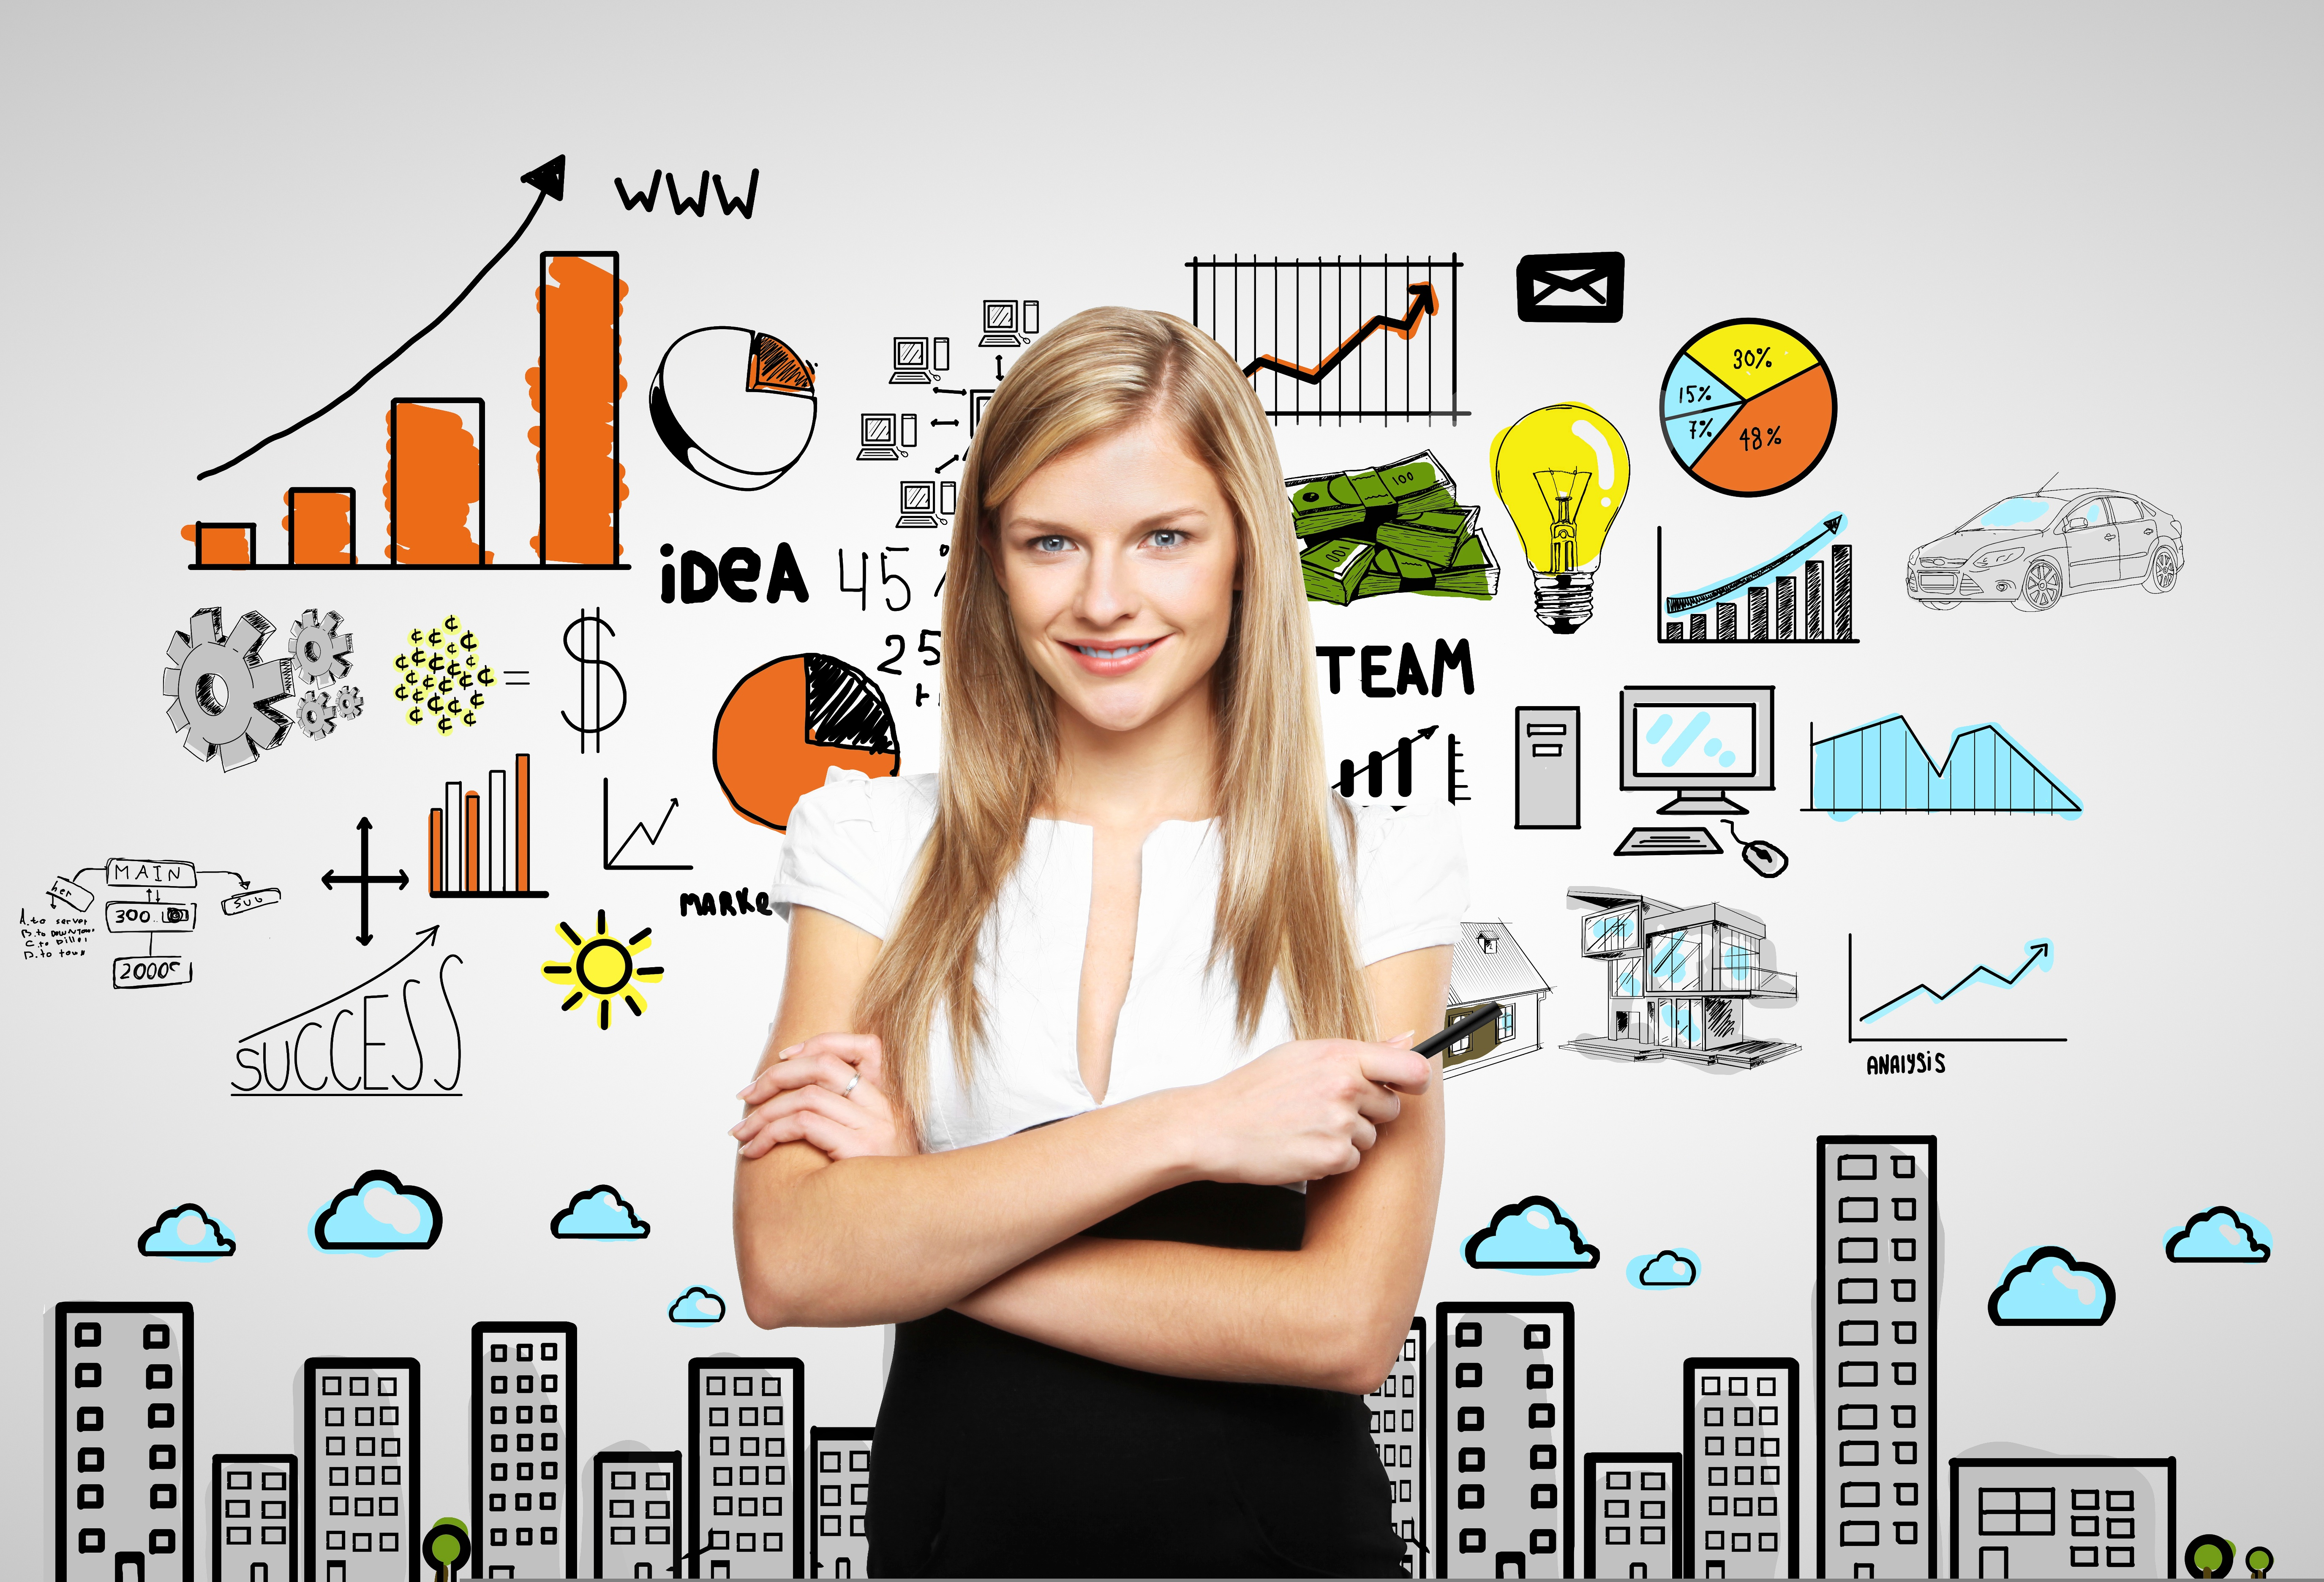 Data_Decisions_-_Website_Woman_Charts.jpg